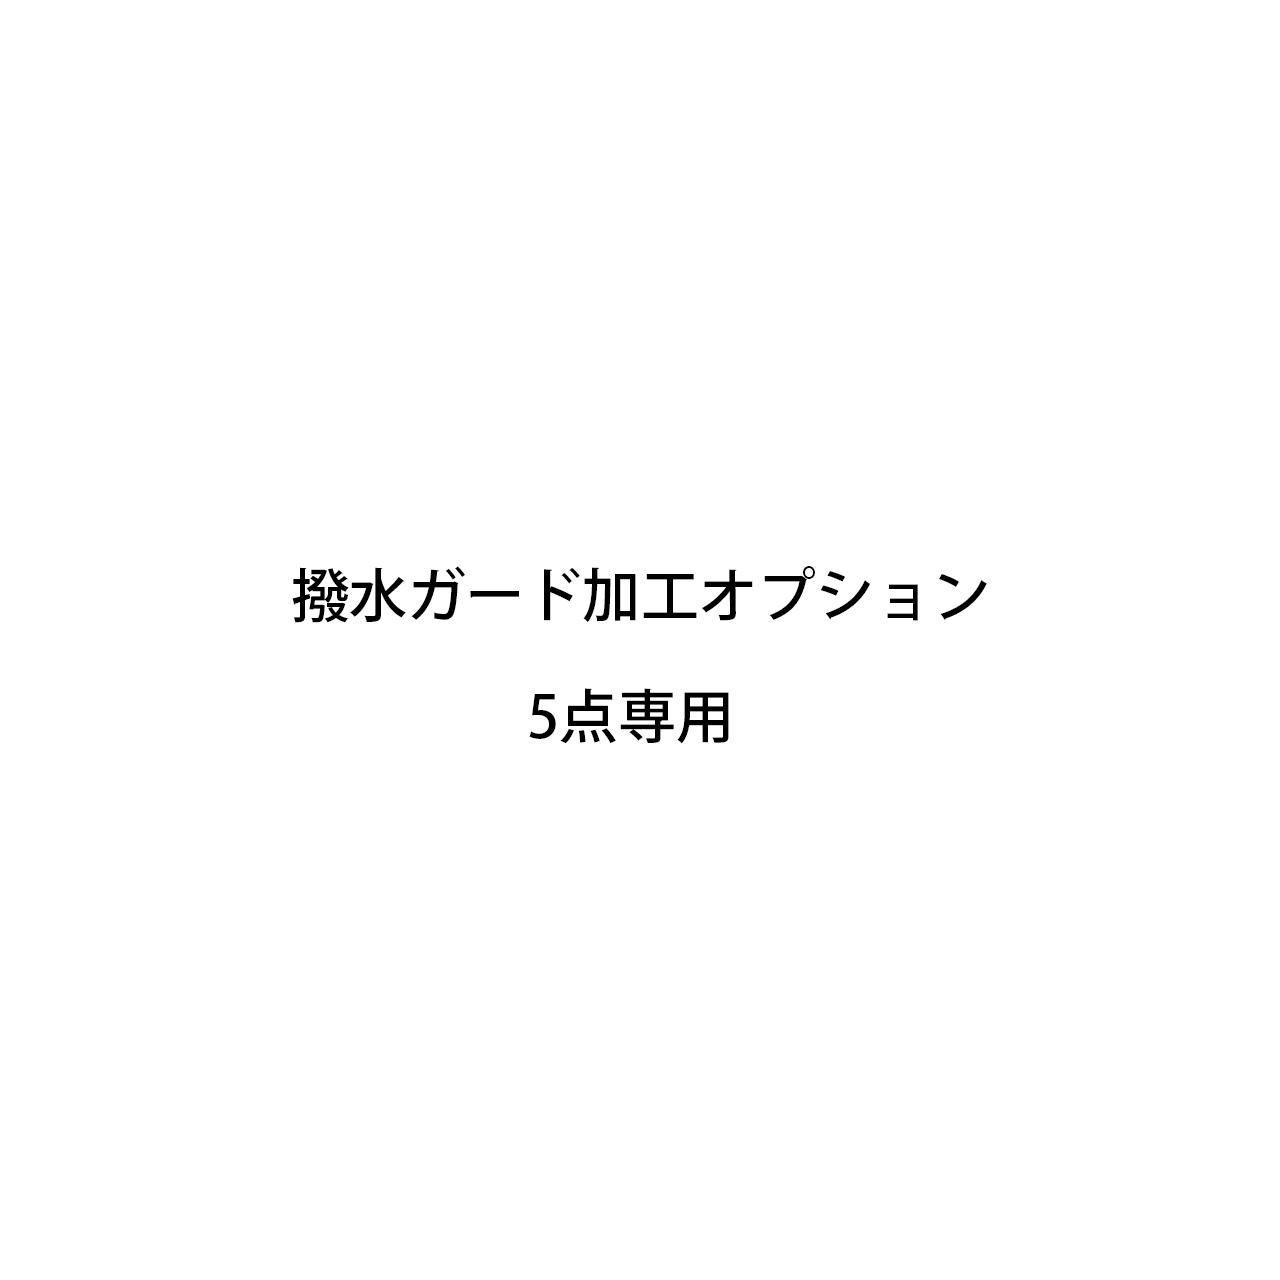 〔CARE MAINTENANCE_5 専用オプション〕撥水ガード加工5点